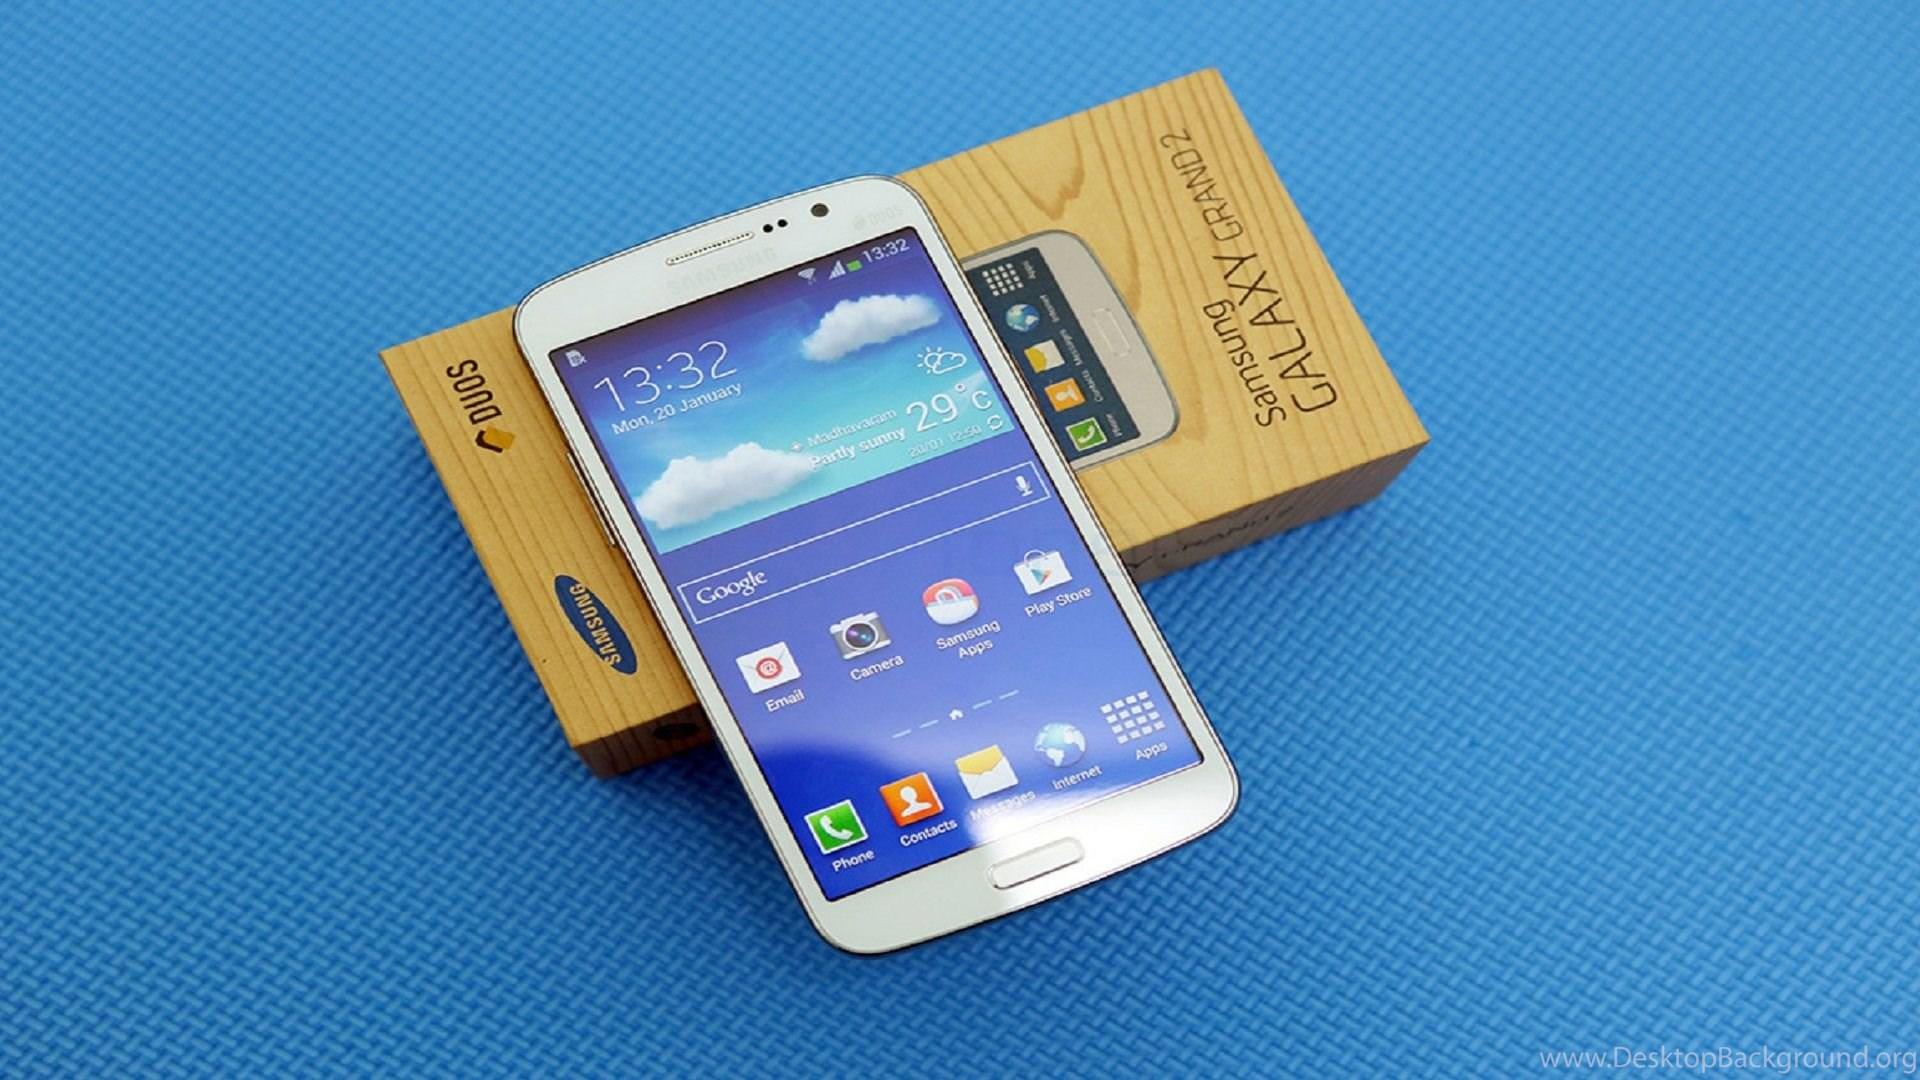 Samsung Galaxy Grand 2 Photos Images 18 Free Wallpapers Hd Jpg